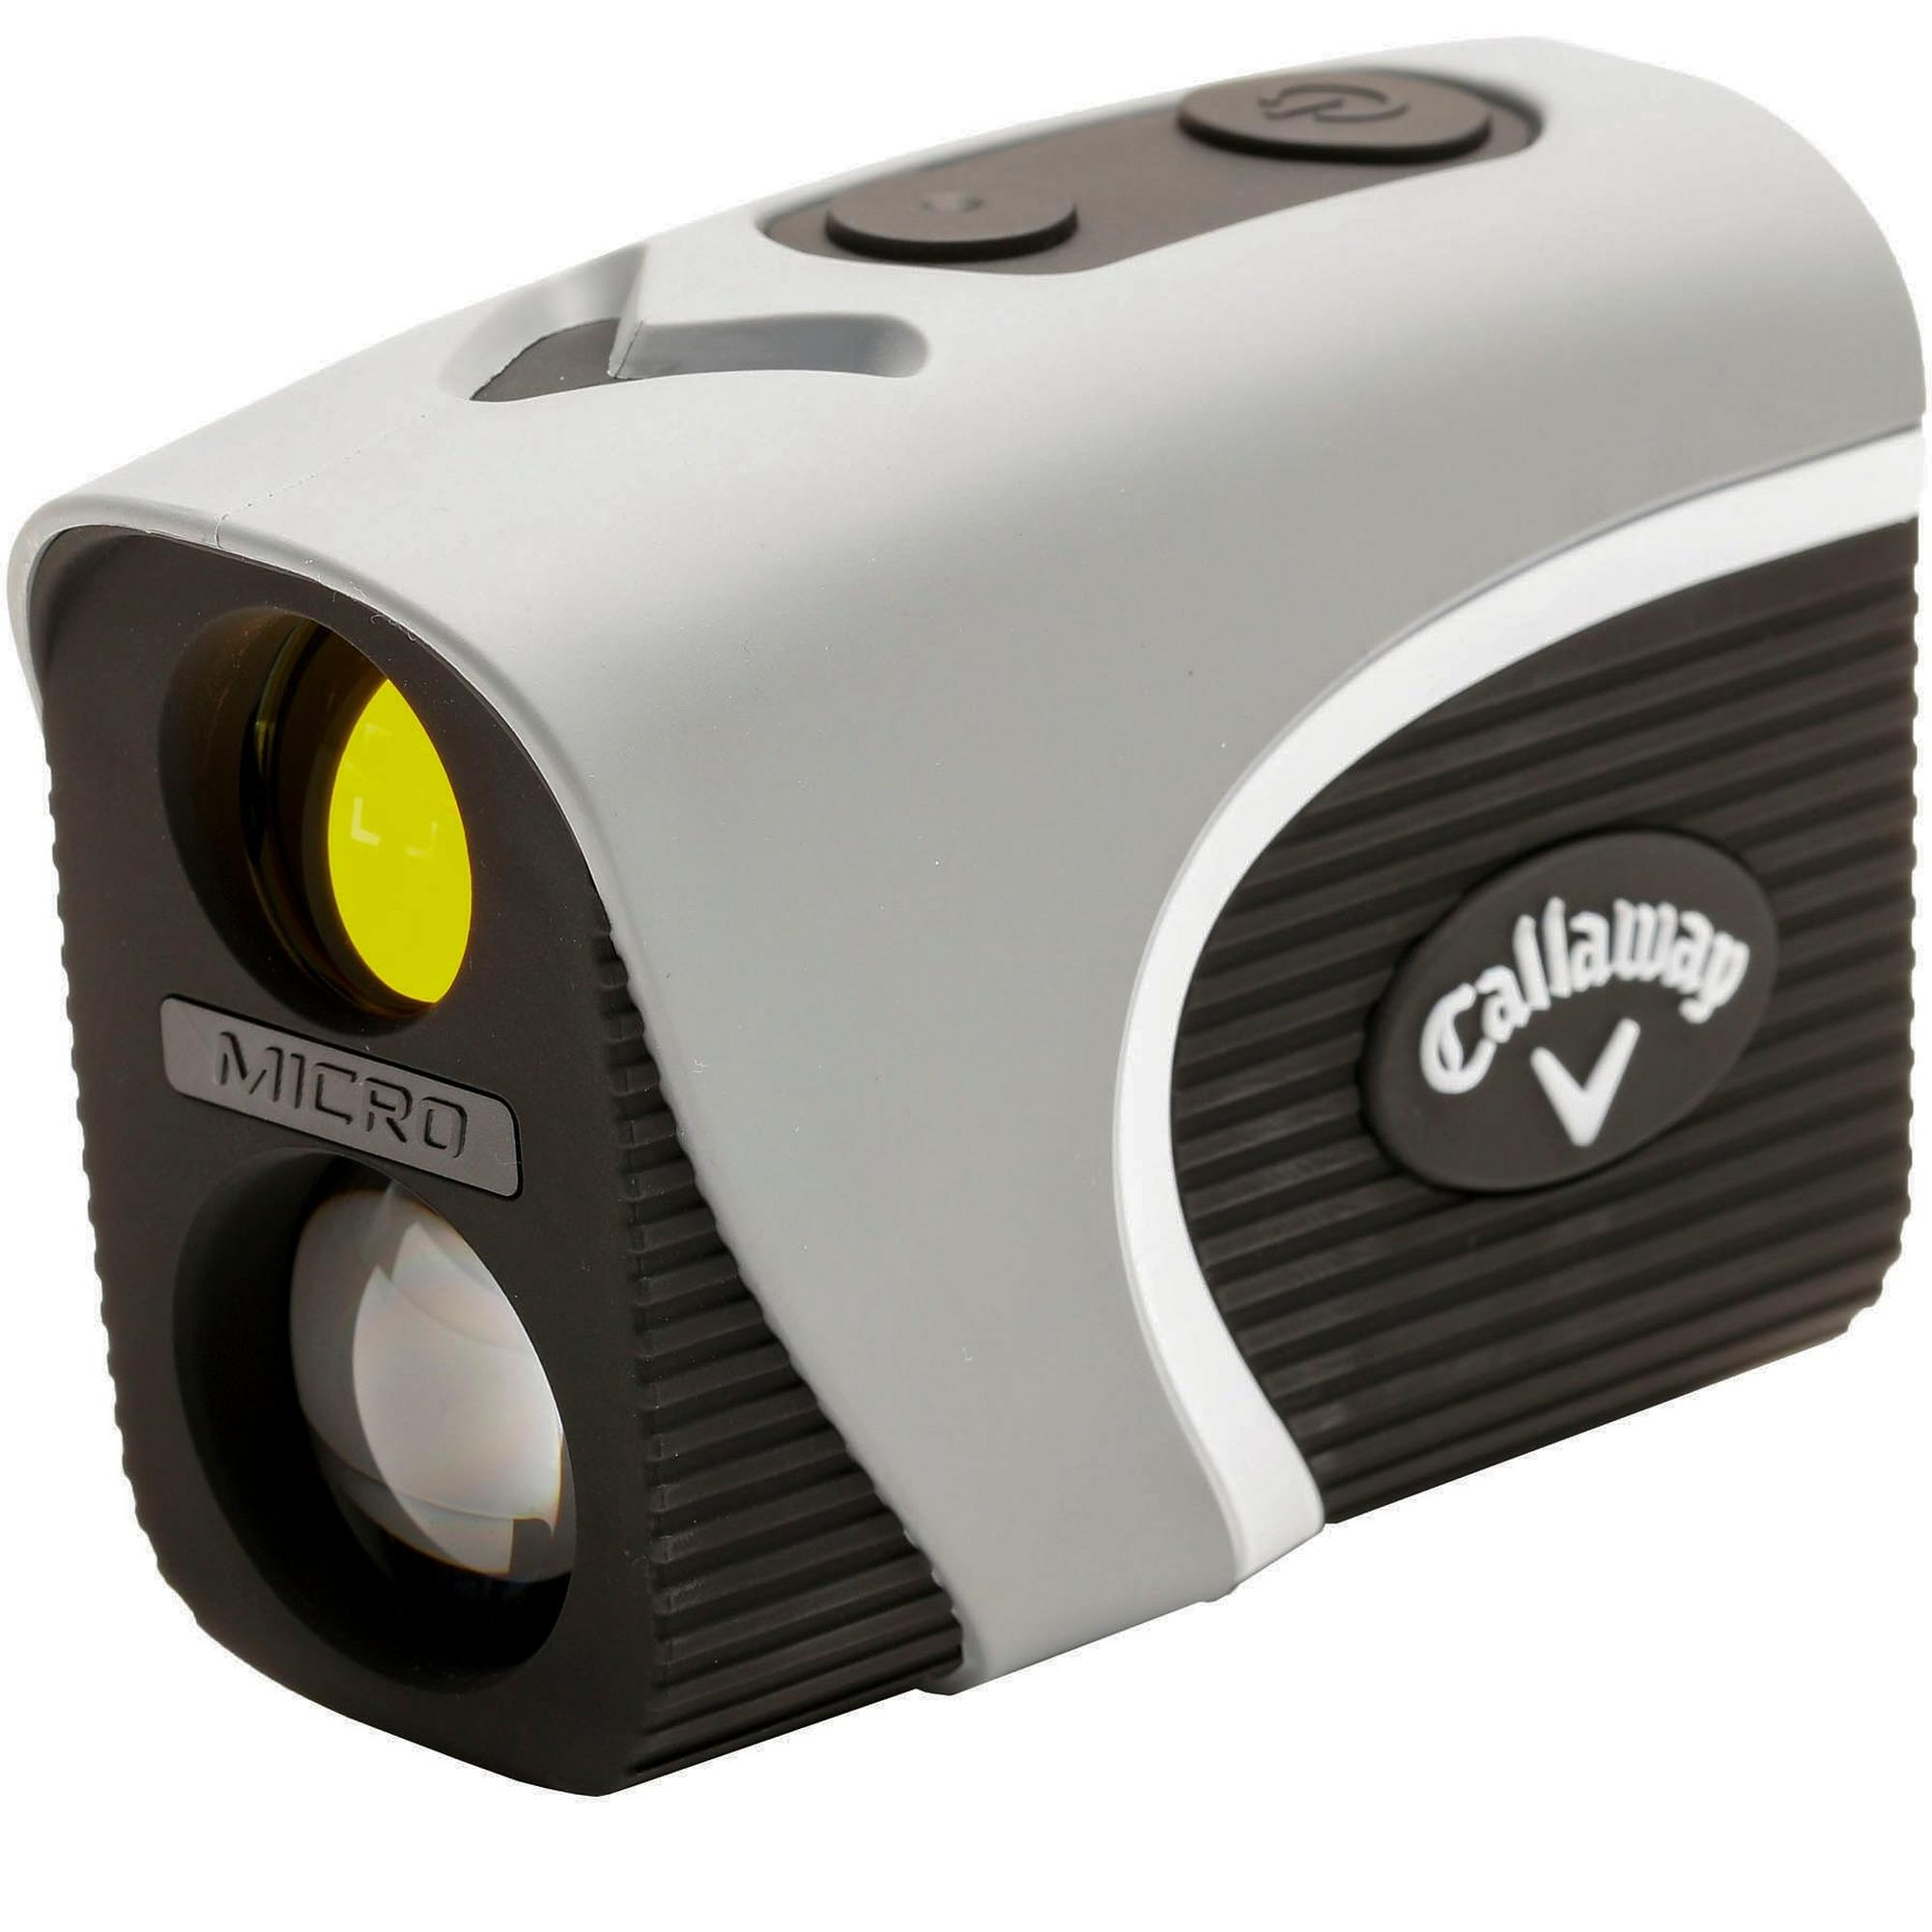 Micro Rangefinder